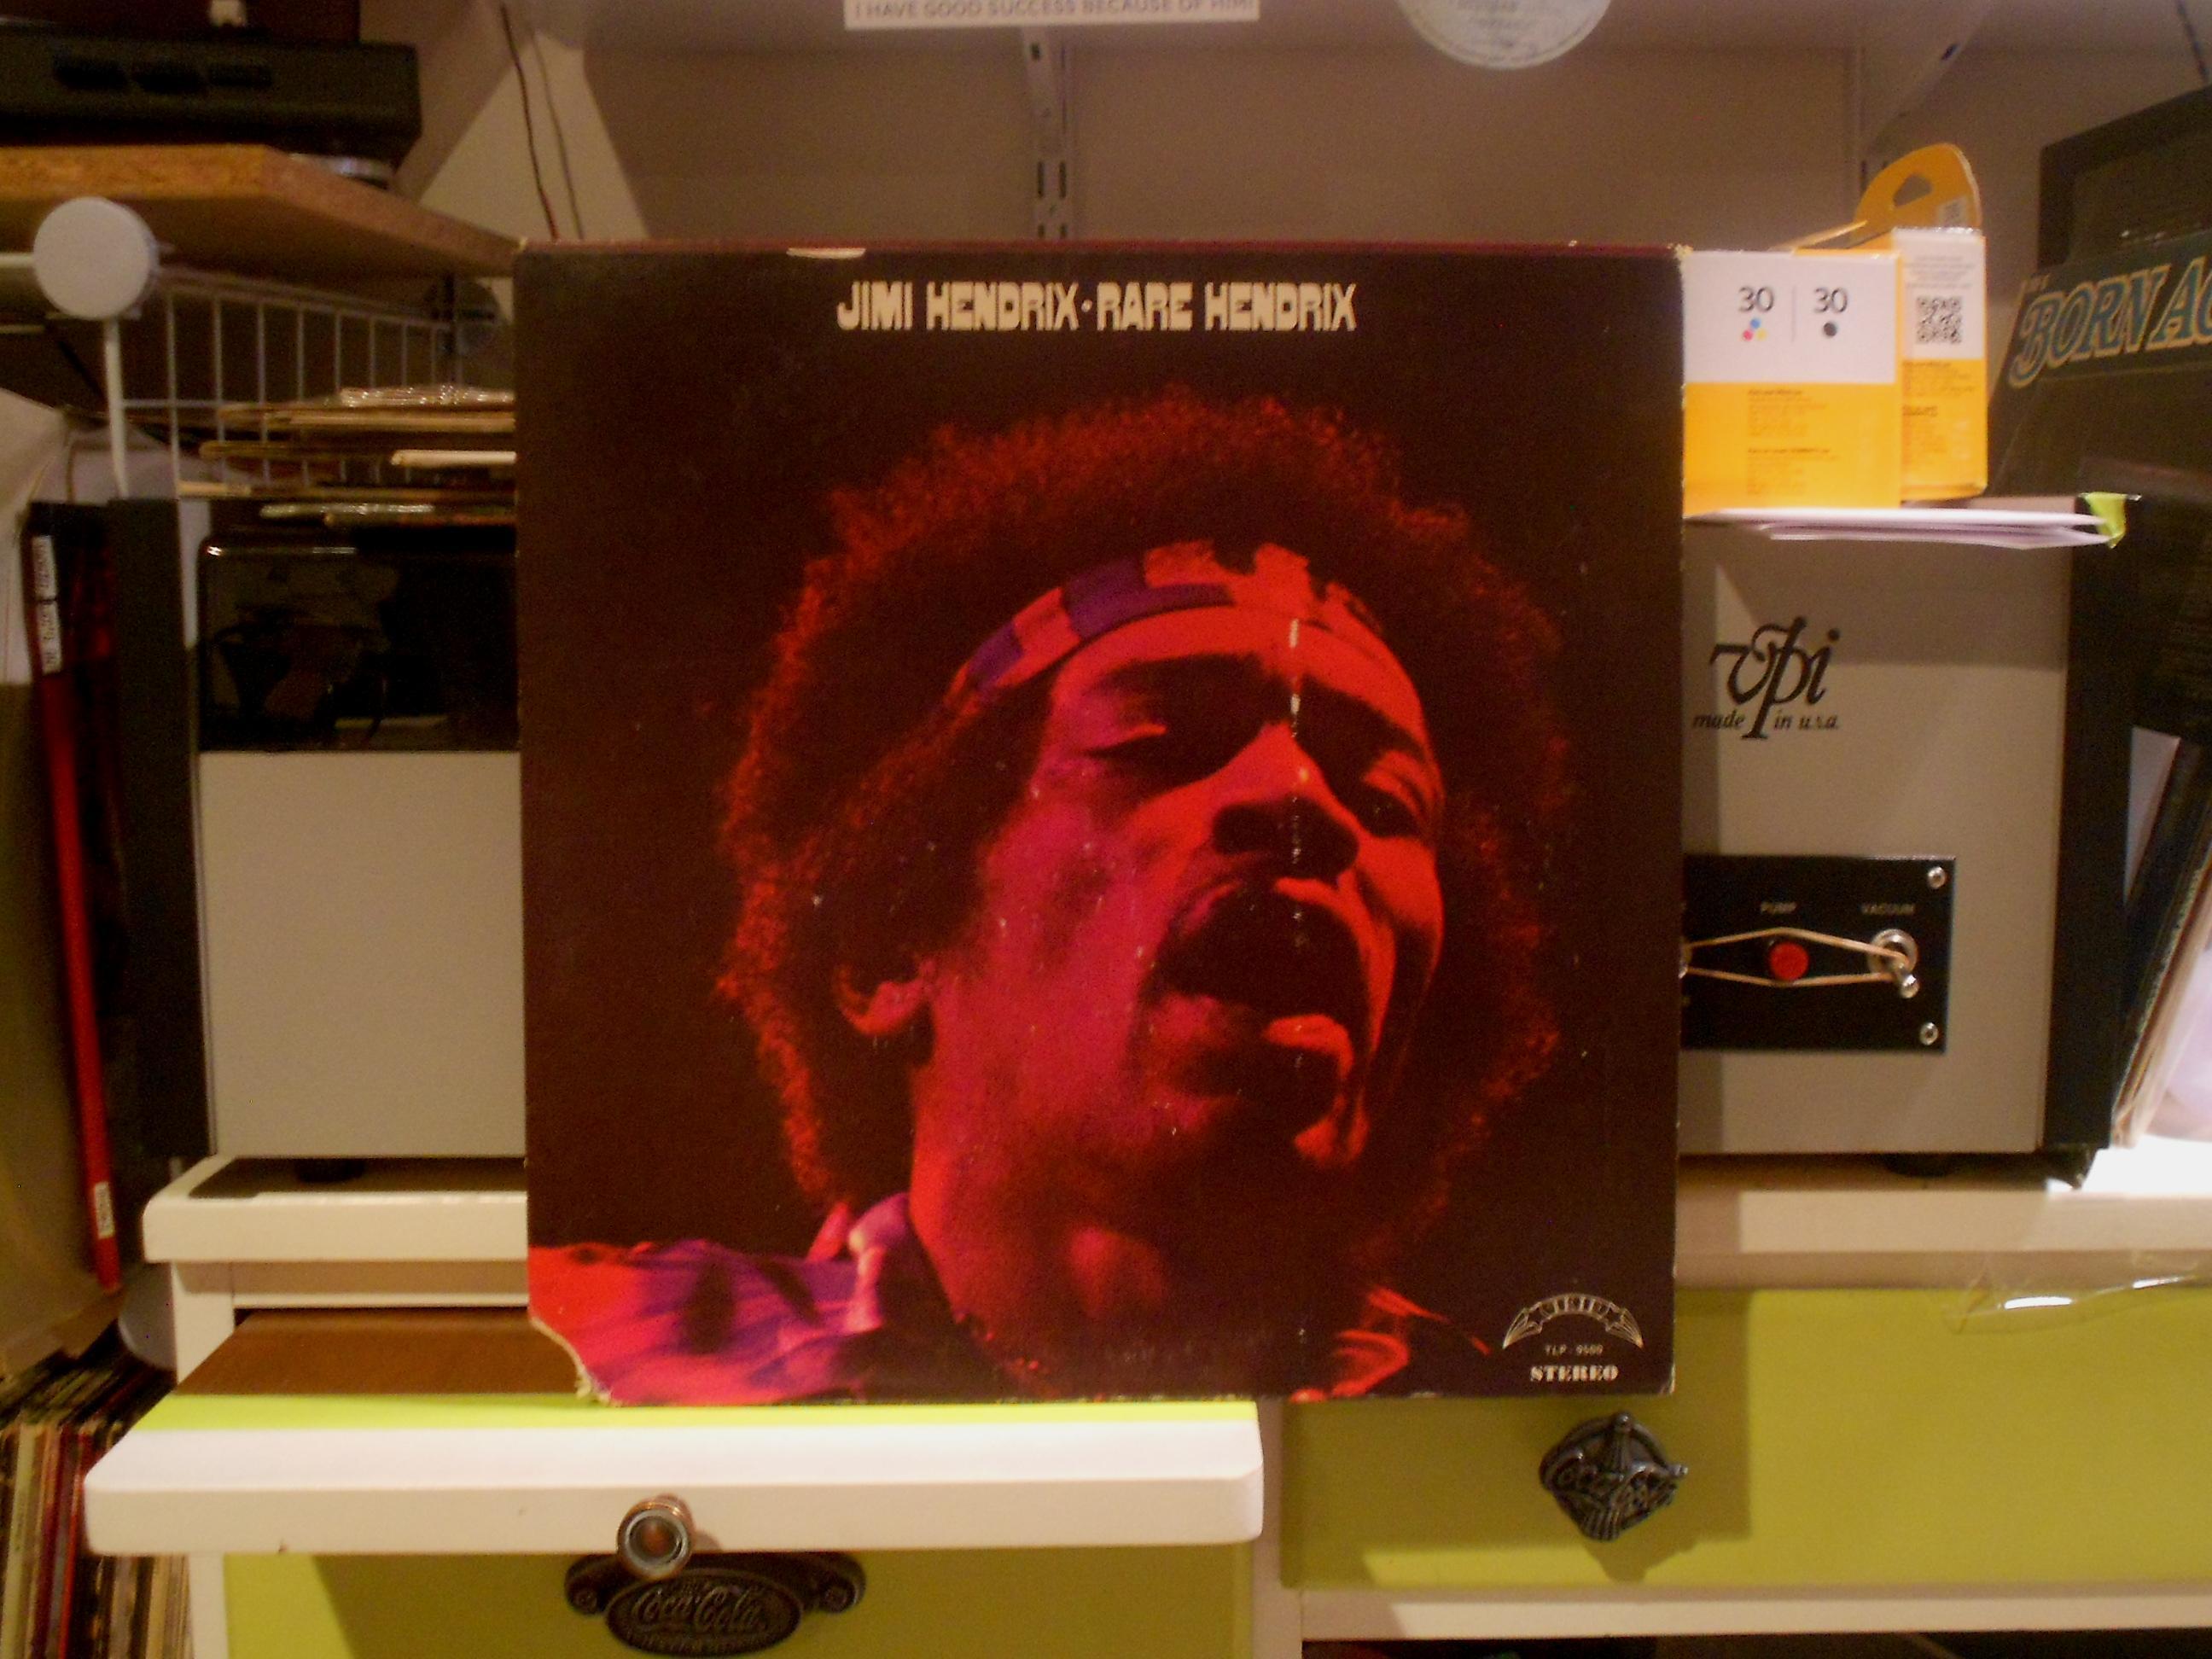 Jimi Hendrix - Rare Hendrix Lp